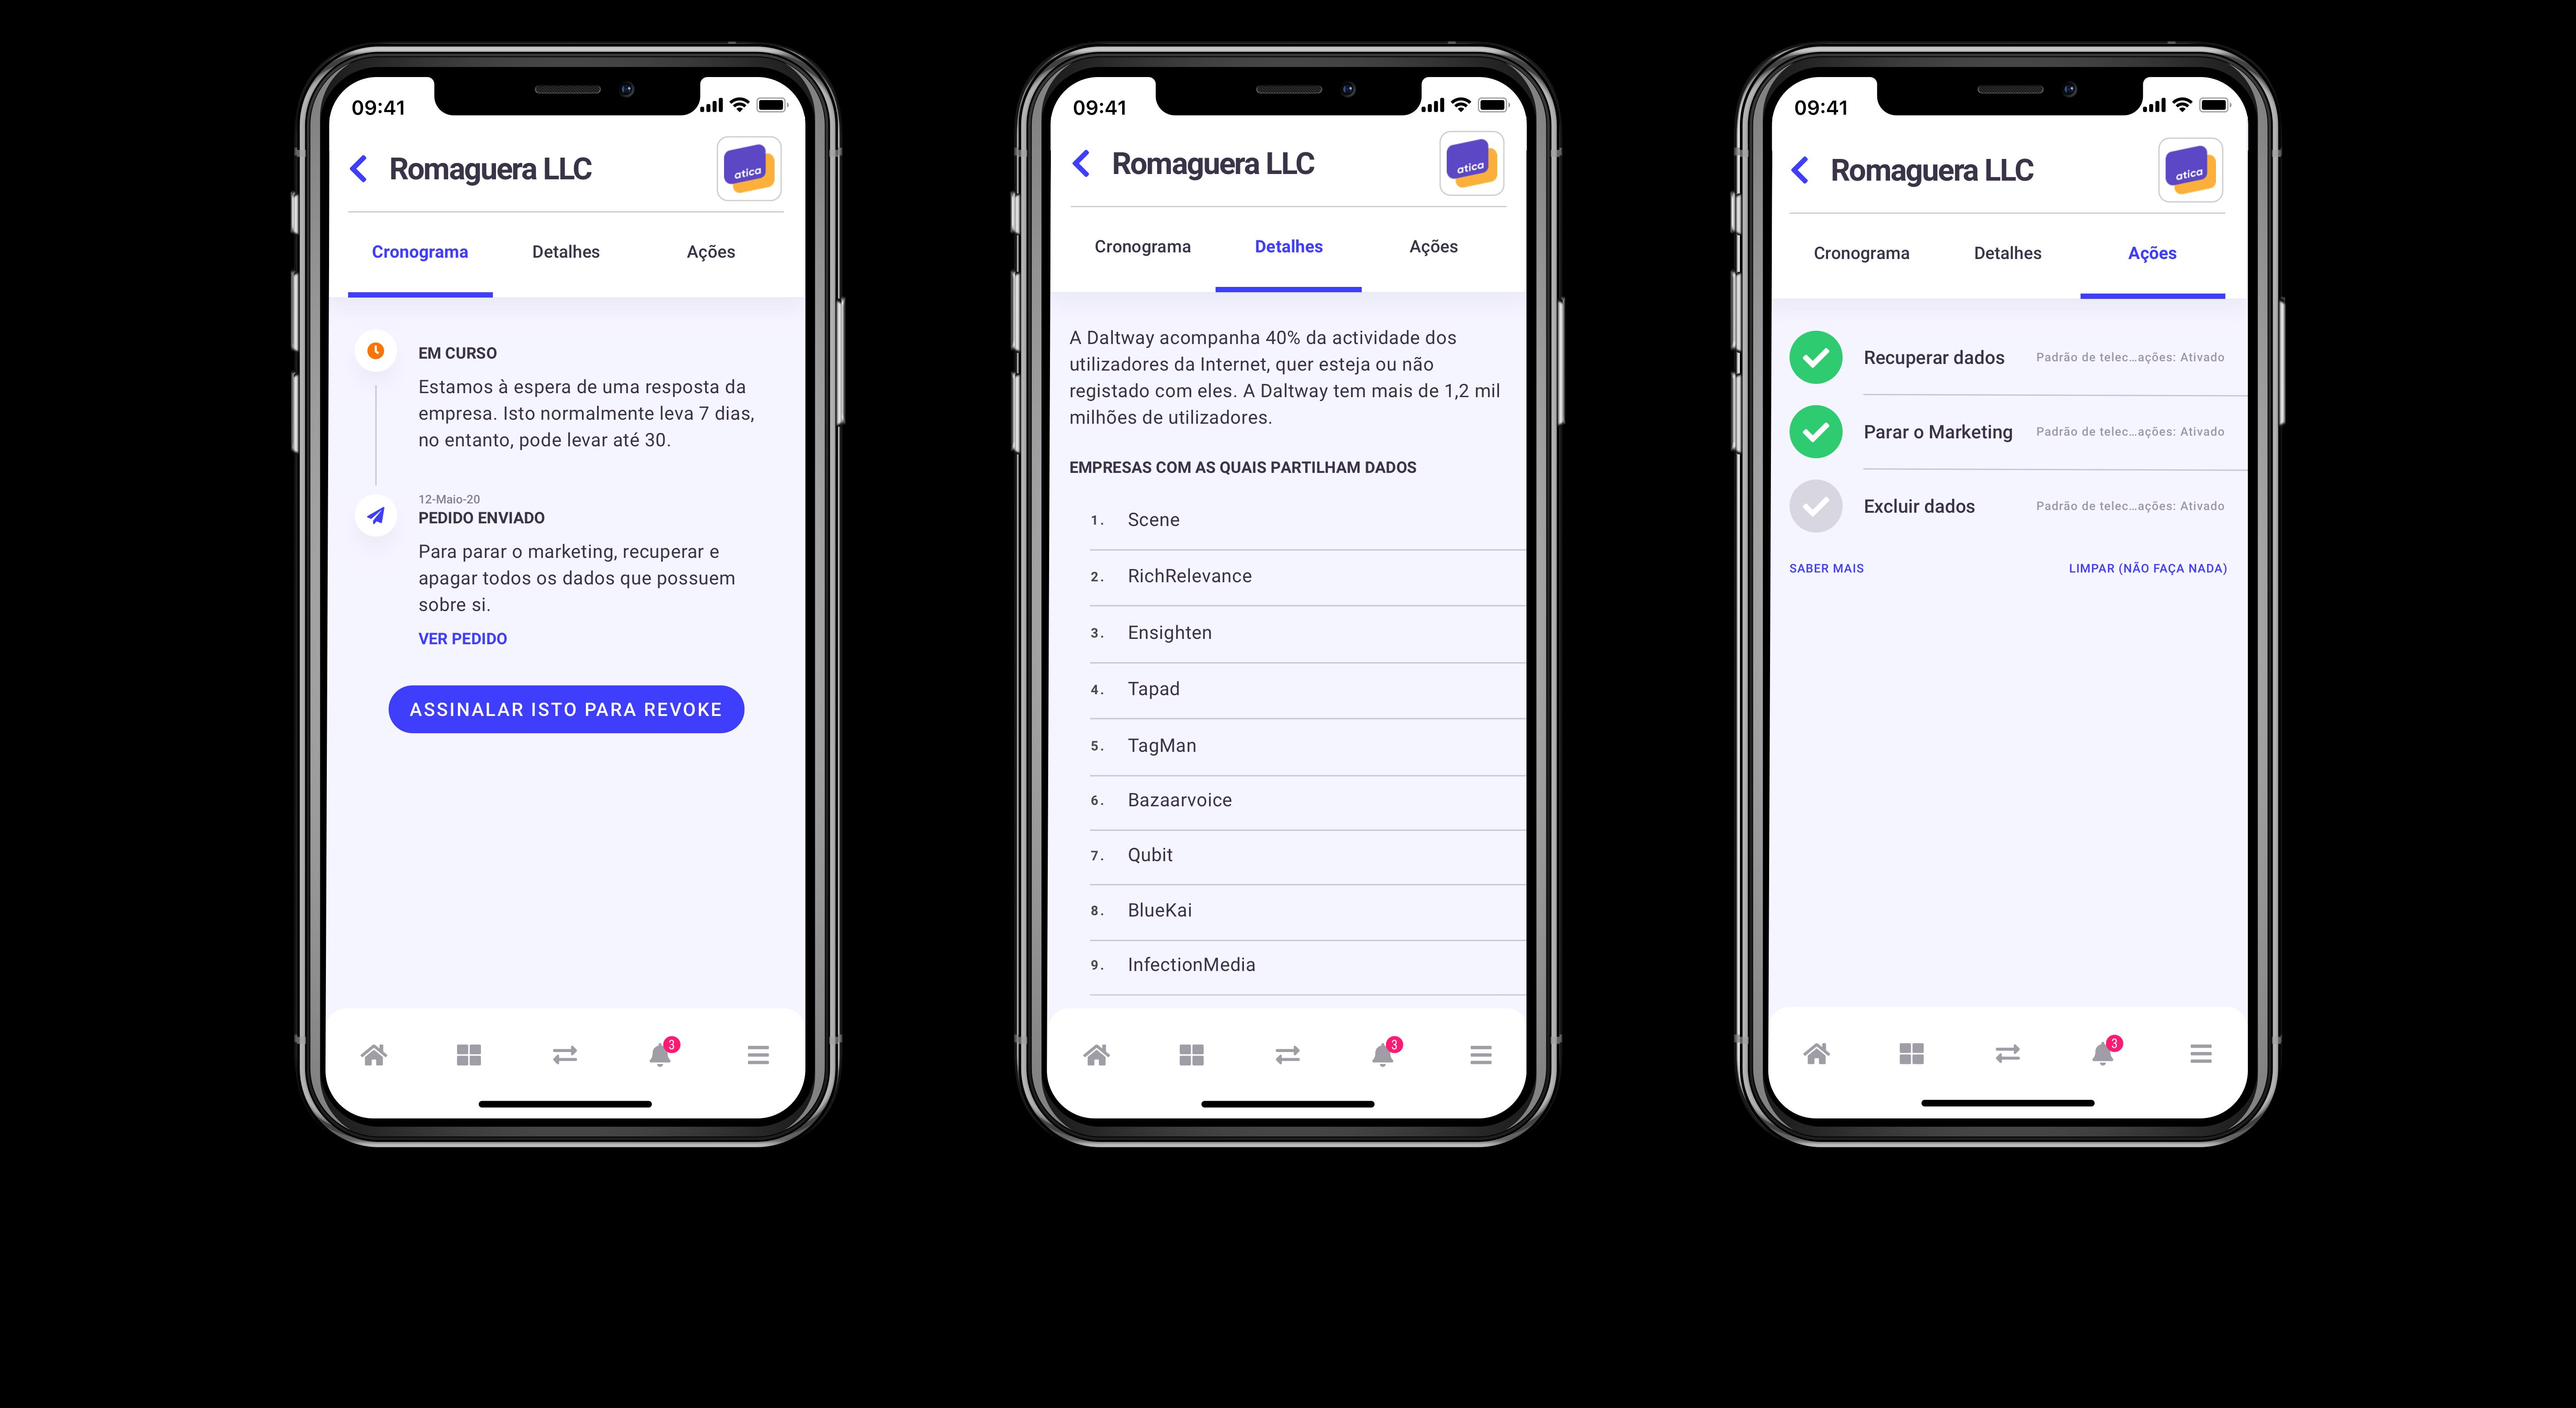 https://revoke.com/wp-content/uploads/2020/09/customer-submits-data-portuguese.png